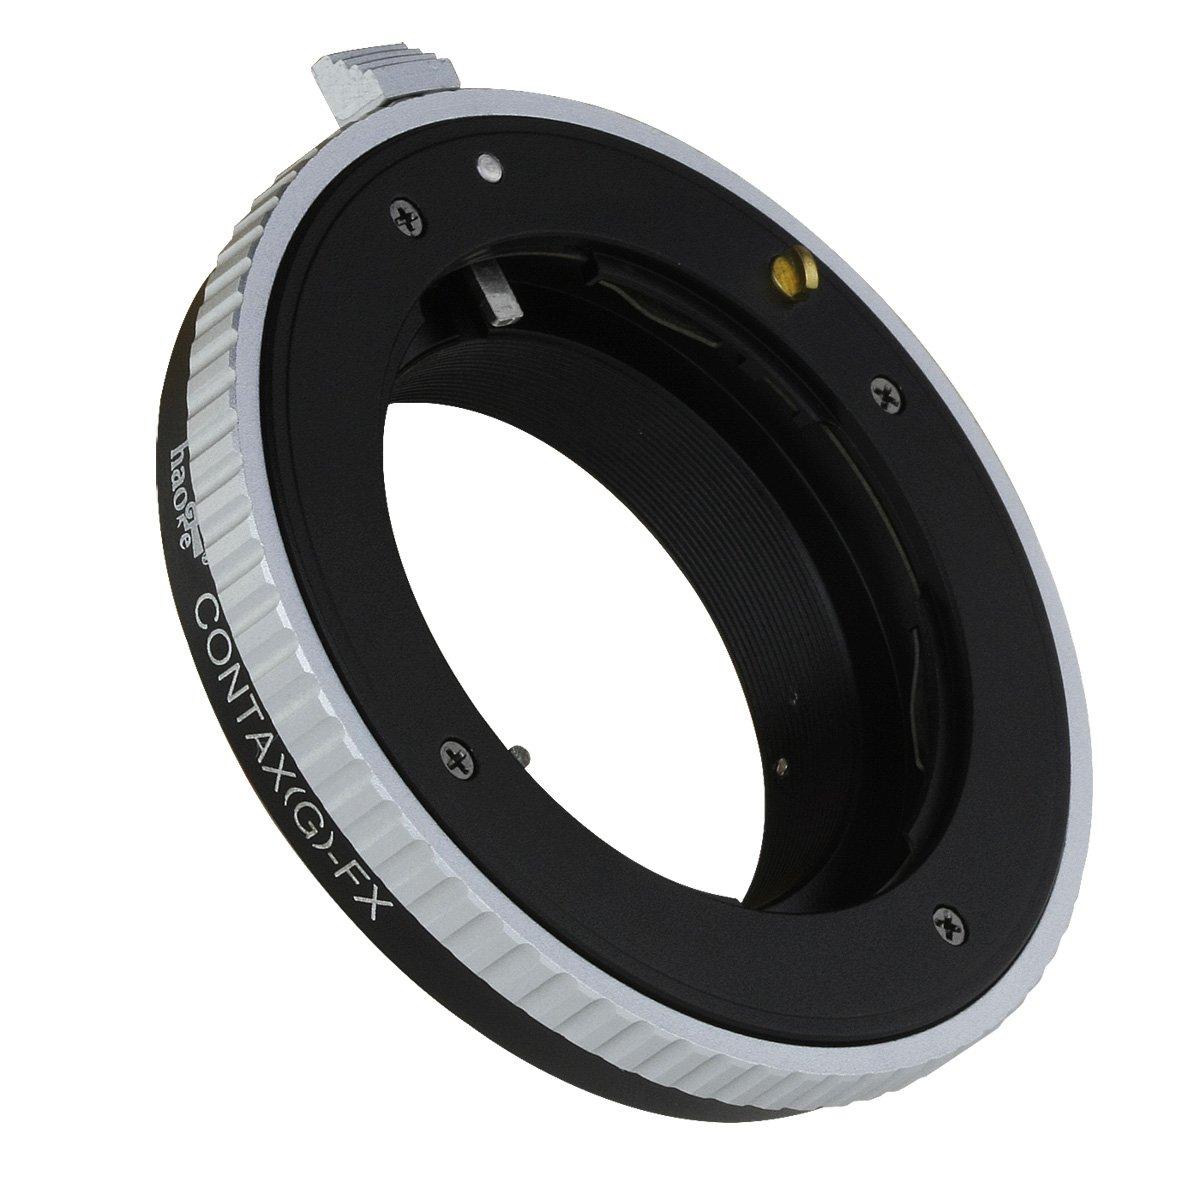 Haoge Lens Mount Adapter for Minolta Rokkor MD MC mount Lens to Fujifilm X FX mount Camera such as X-A5 X-A10 X-A20 X-E1 X-E2 X-E2s X-E3 X-H1 X-M1 X-Pro1 X-Pro2 X-T1 X-T2 X-T3 X-T10 X-T20 X-T30 X-T100